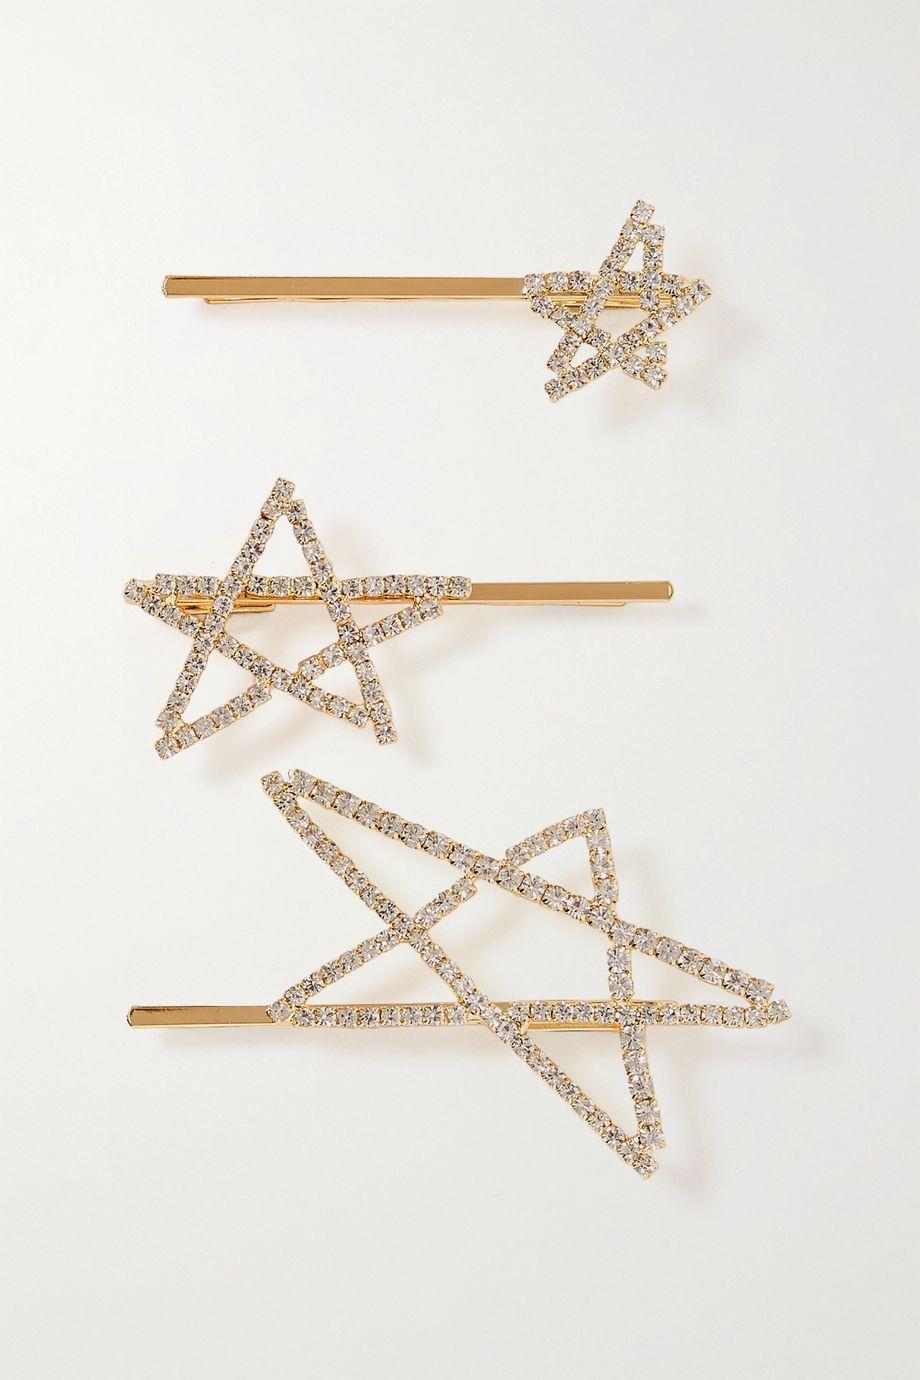 LELET NY Seeing Stars 水晶镀金发夹(三枚装)